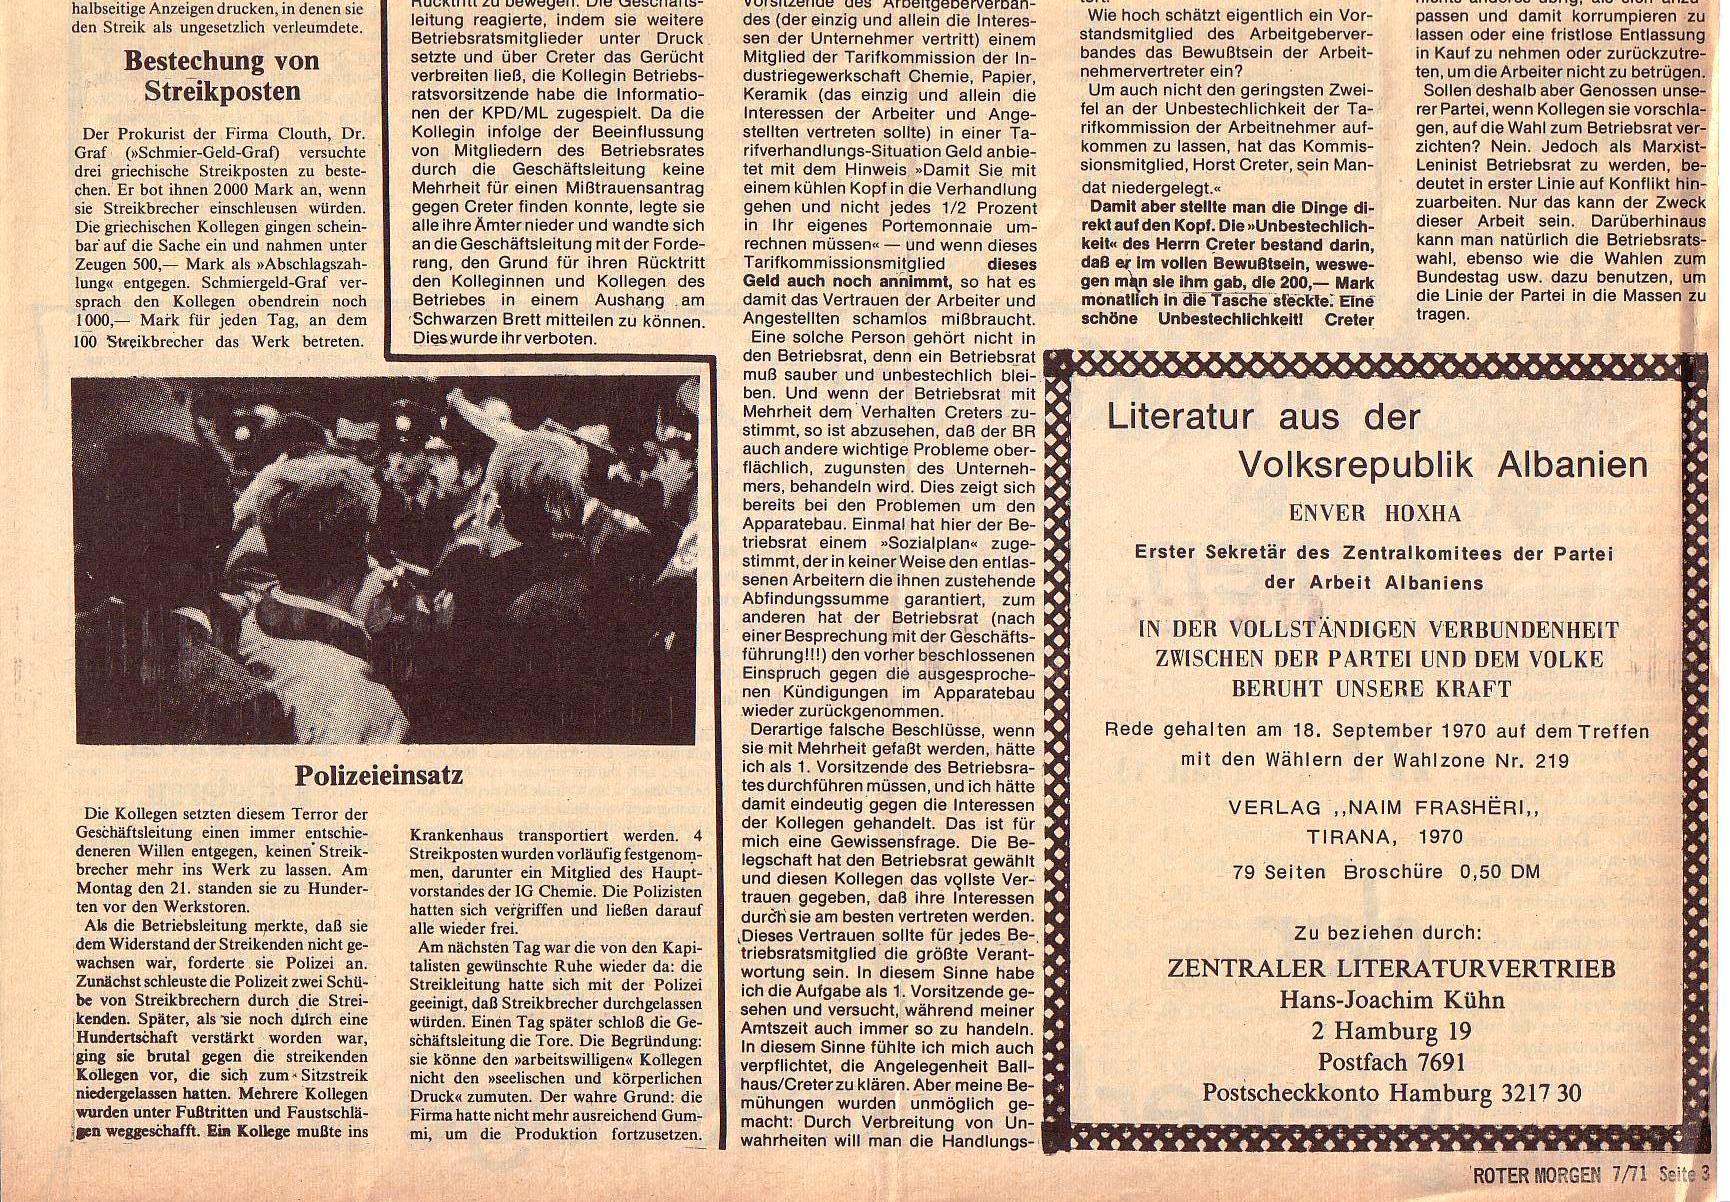 Roter Morgen, 5. Jg., Juli 1971, Nr. 7, Seite 3b